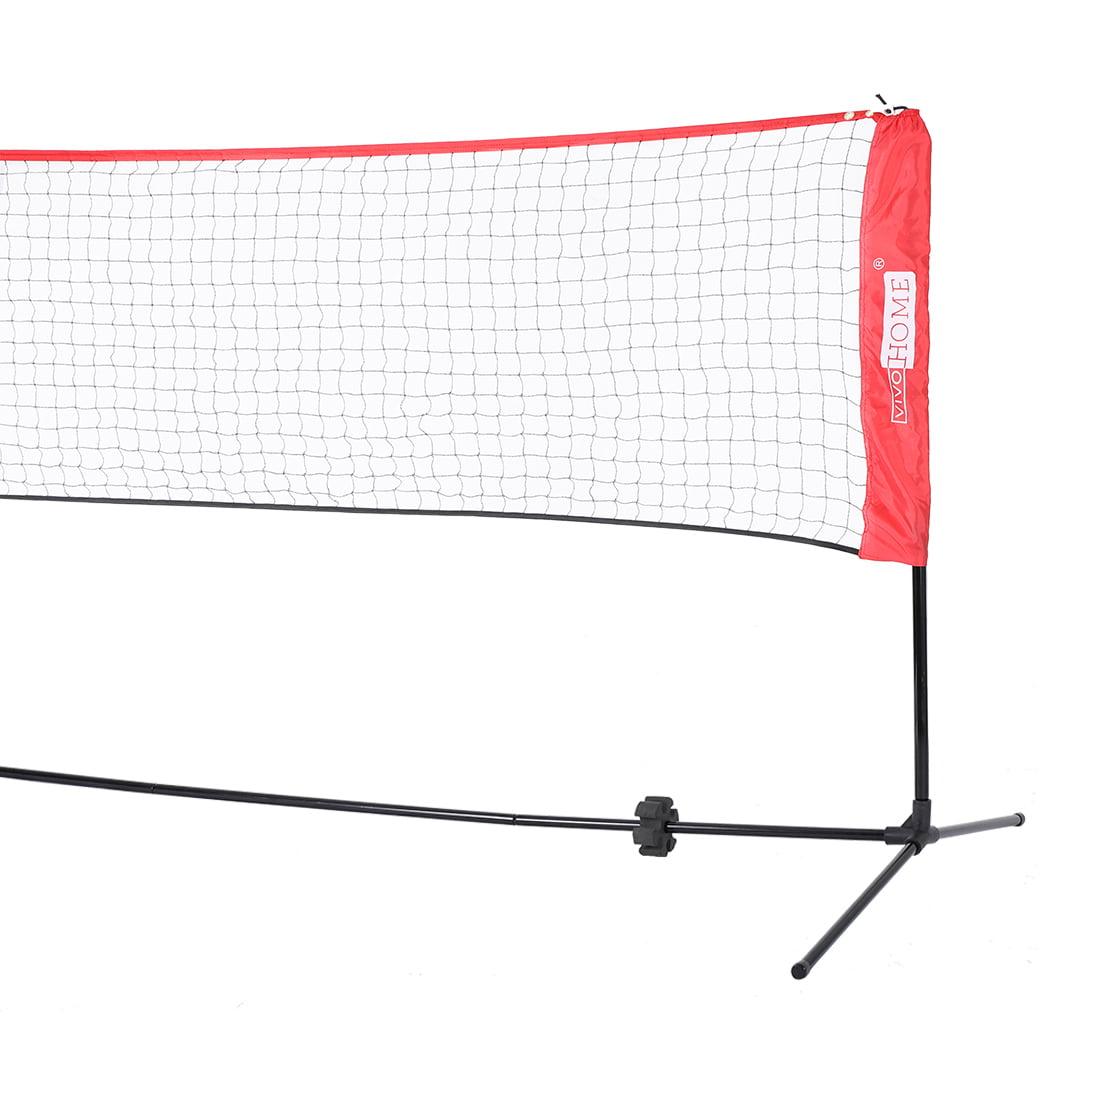 Portable Height Adjustable Outdoor Badminton Volleyball Soccer Tennis Pickleball Net 17ft Walmart Com Walmart Com